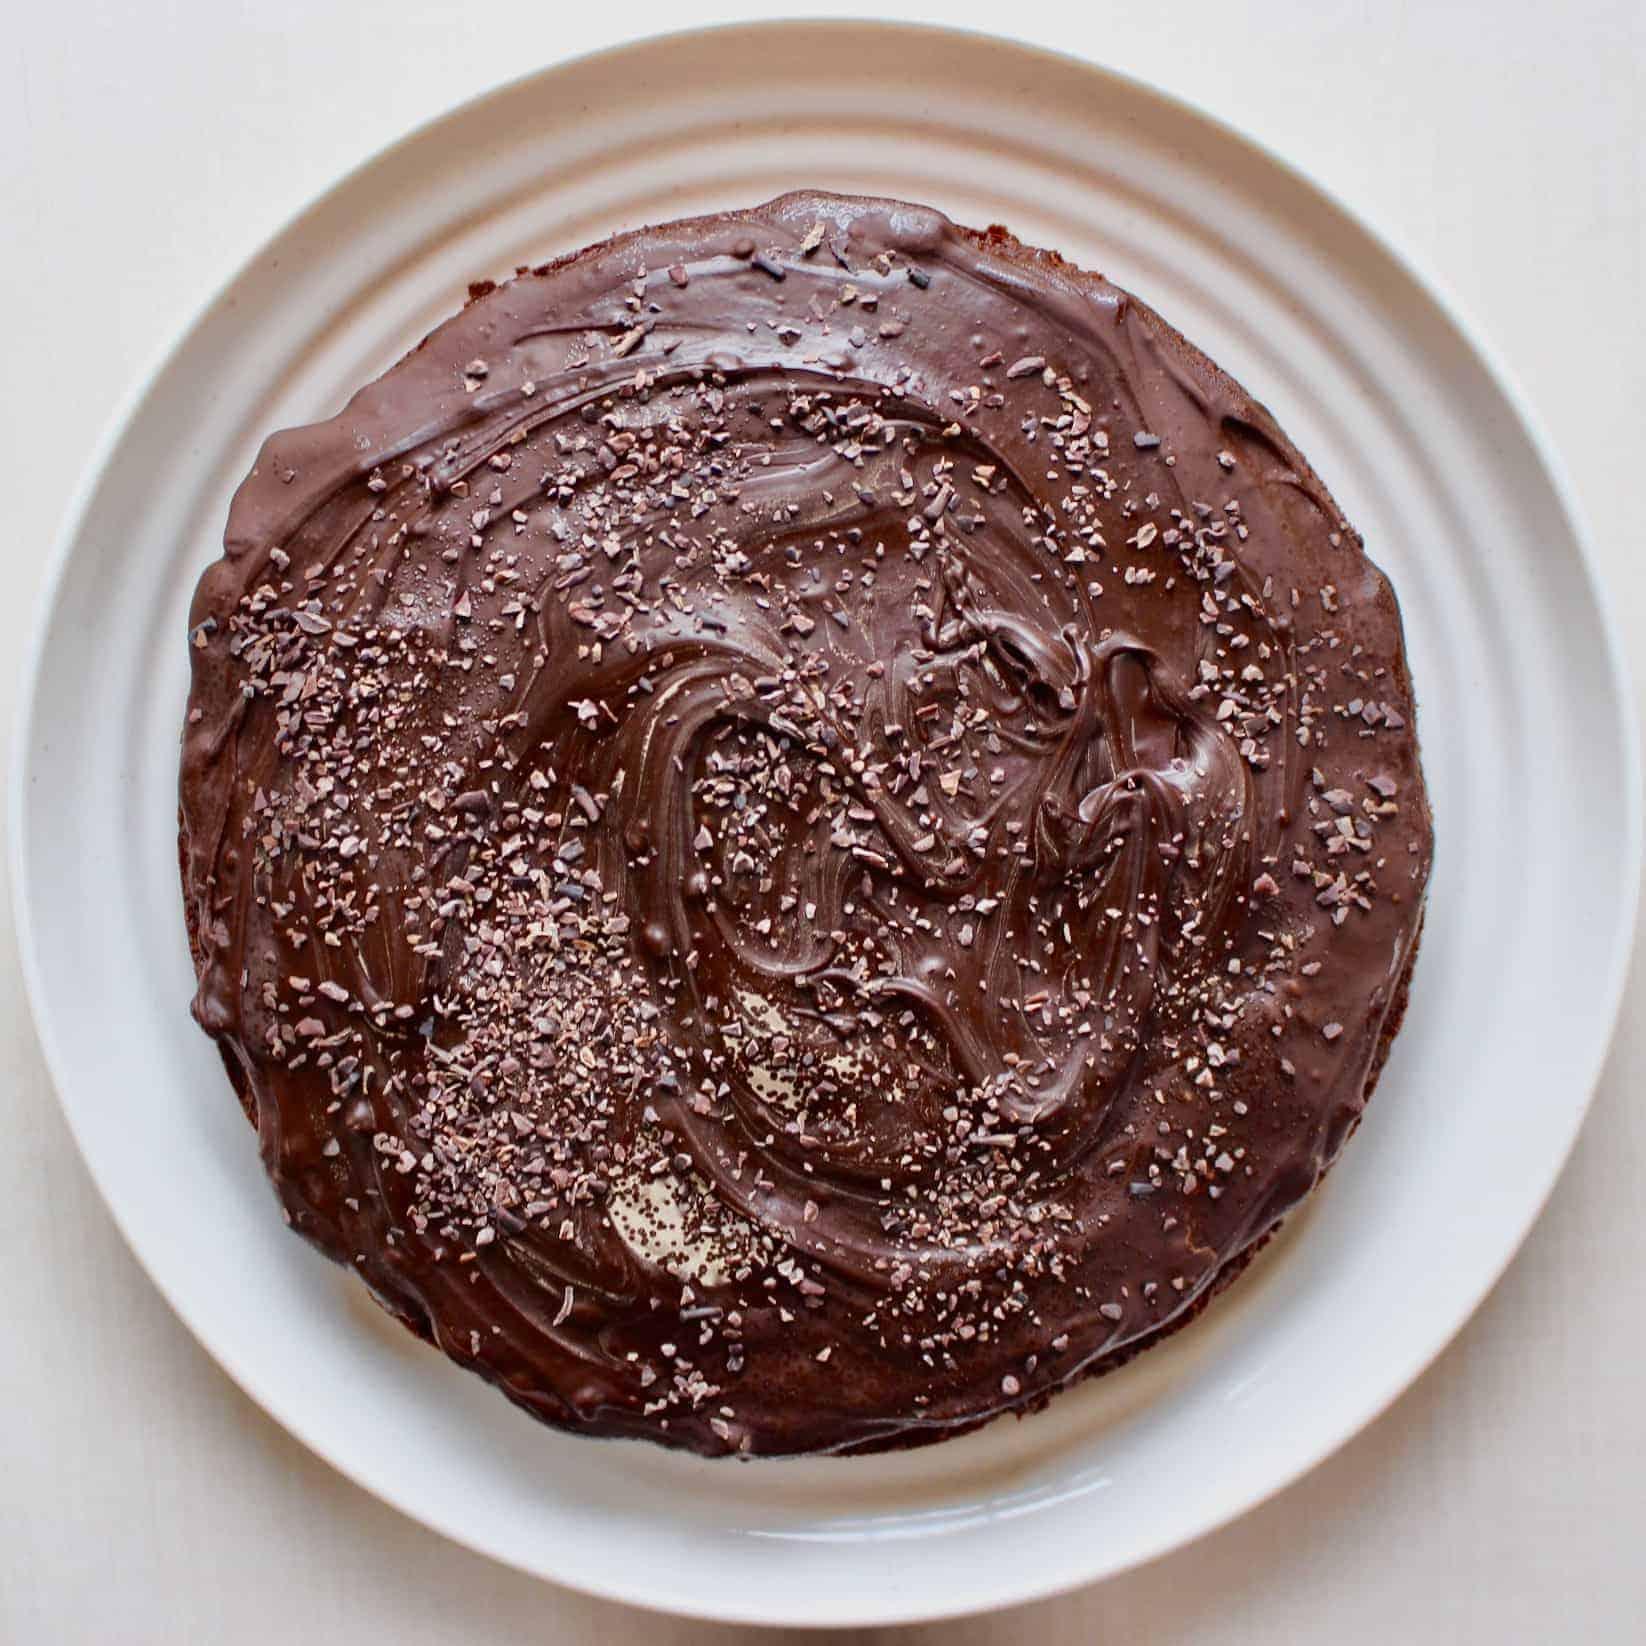 Gluten-Free Vegan Chocolate Hazelnut Cake